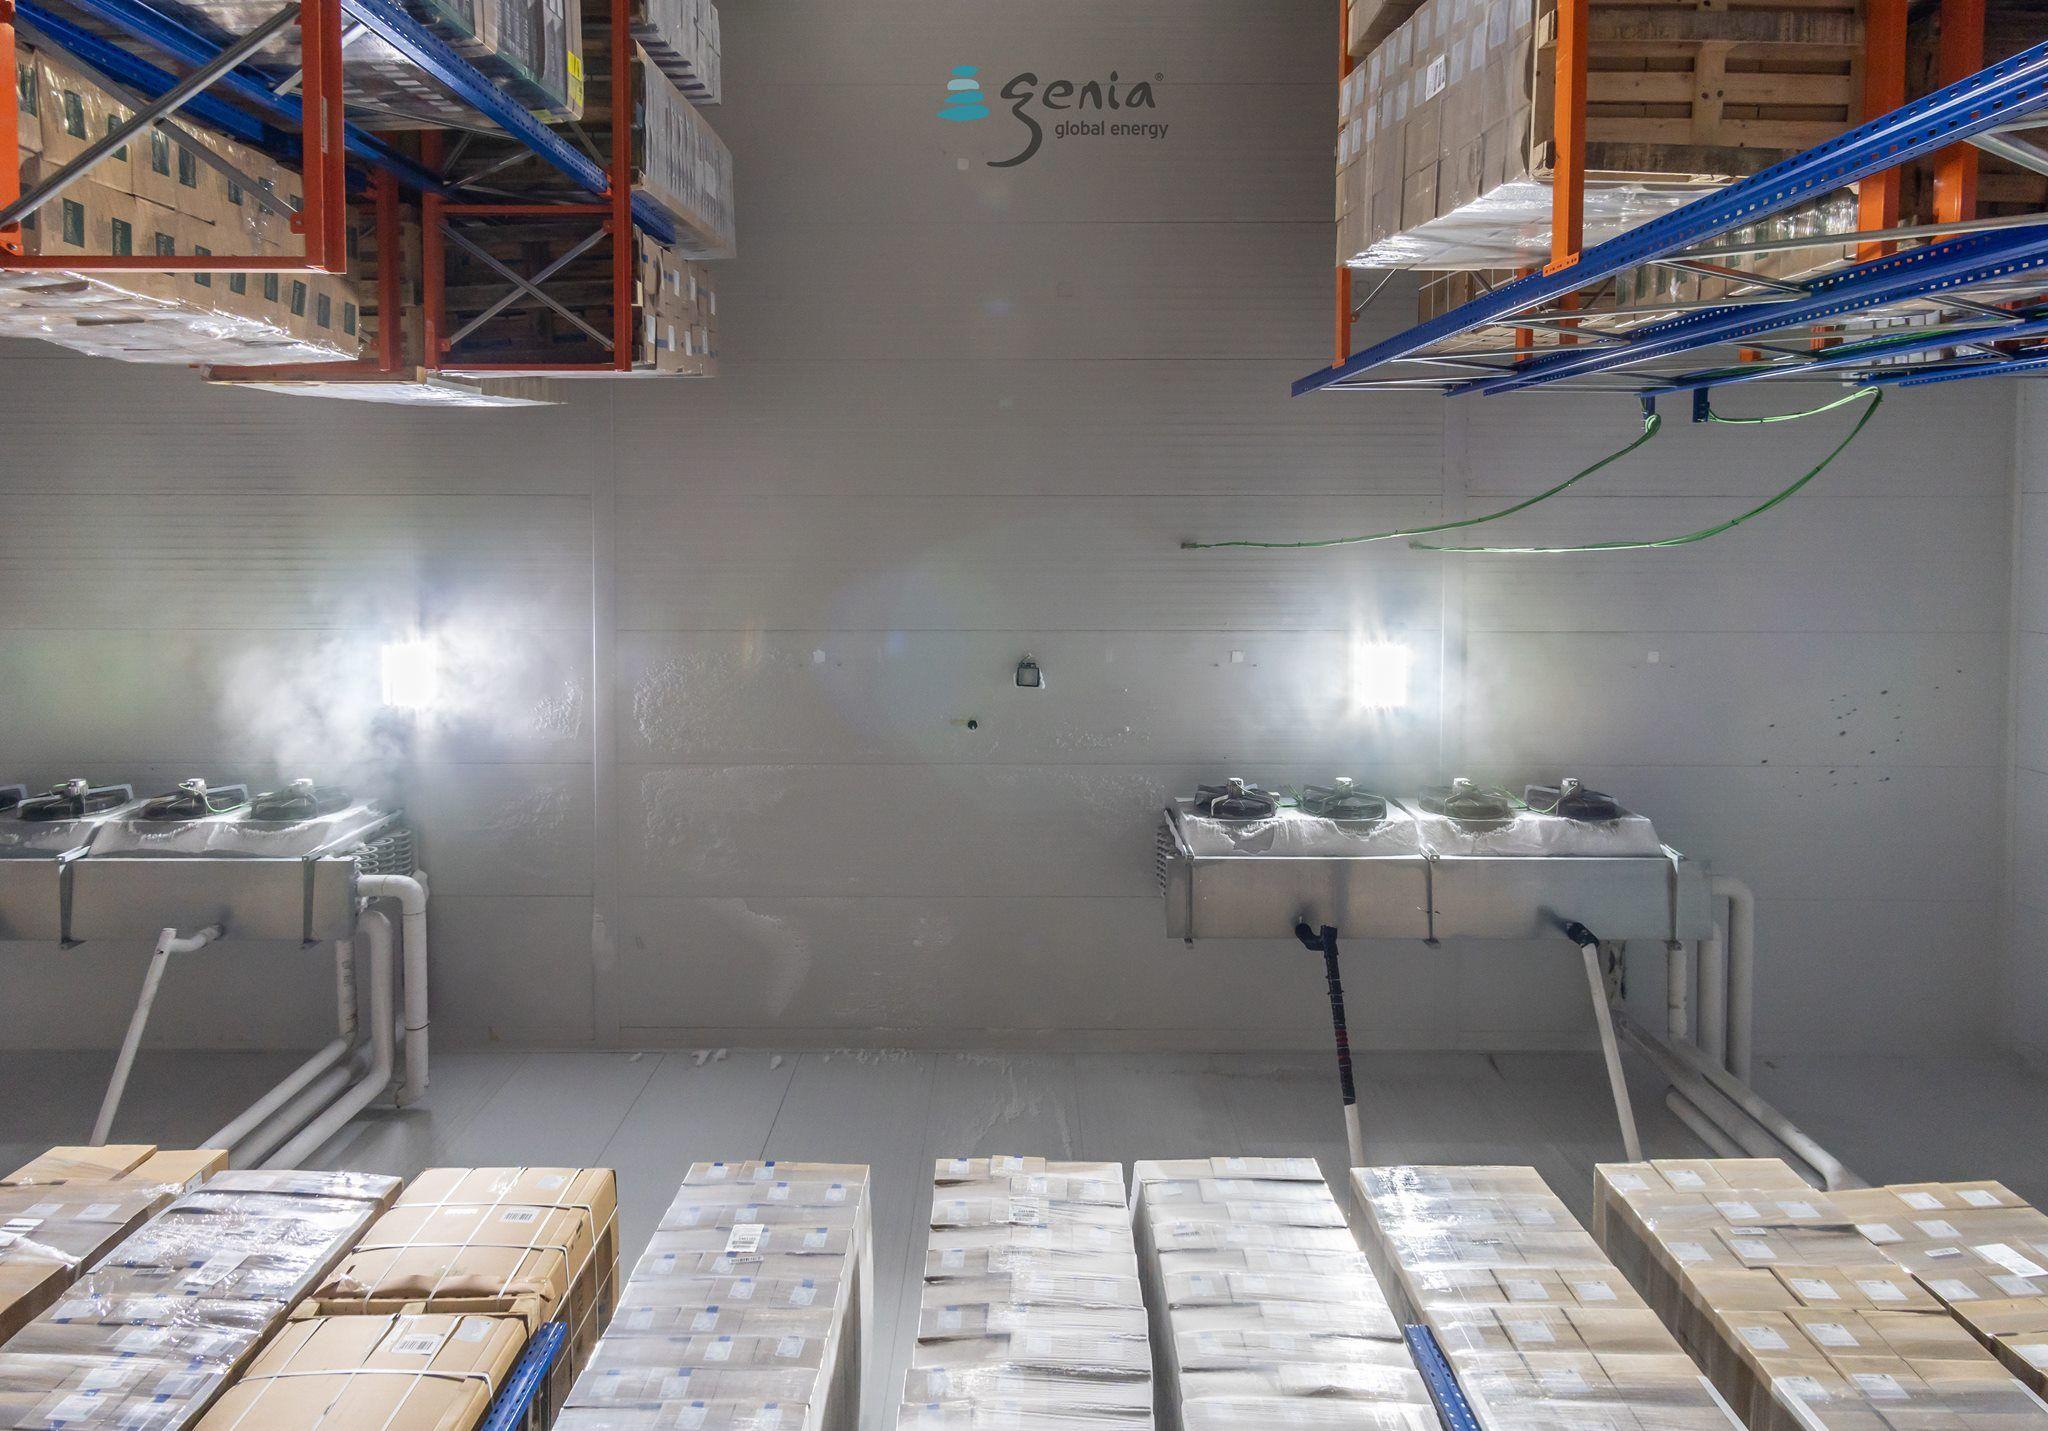 iluminacion-industrial-led-14-metros-altura-20-grados-temperatura